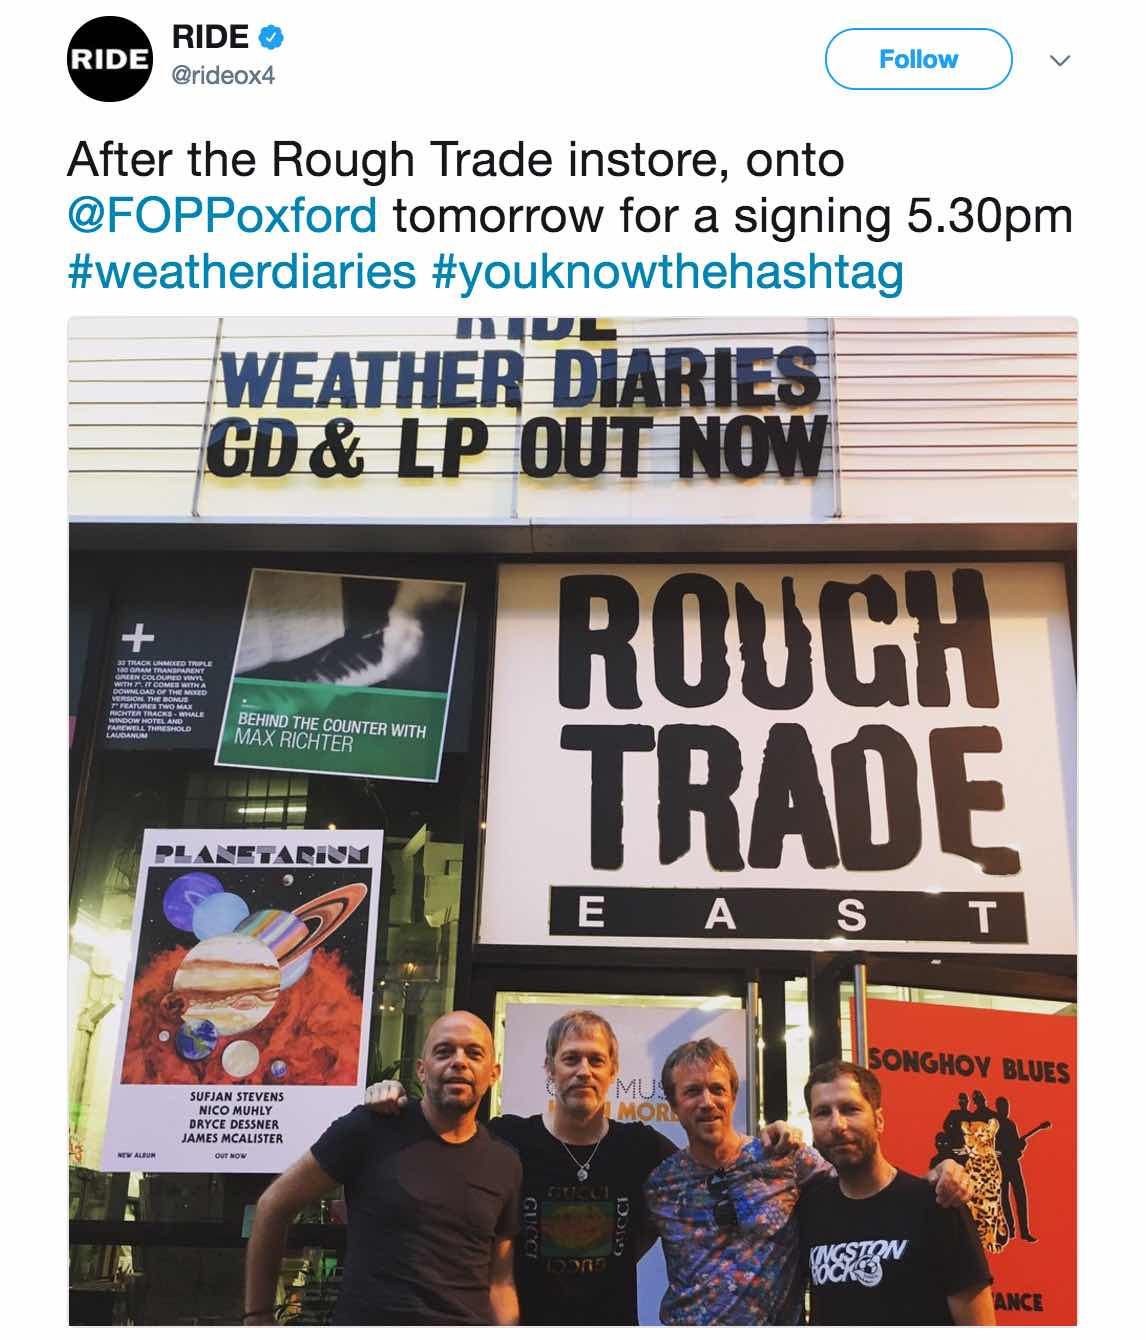 Ride outside Rough Trade